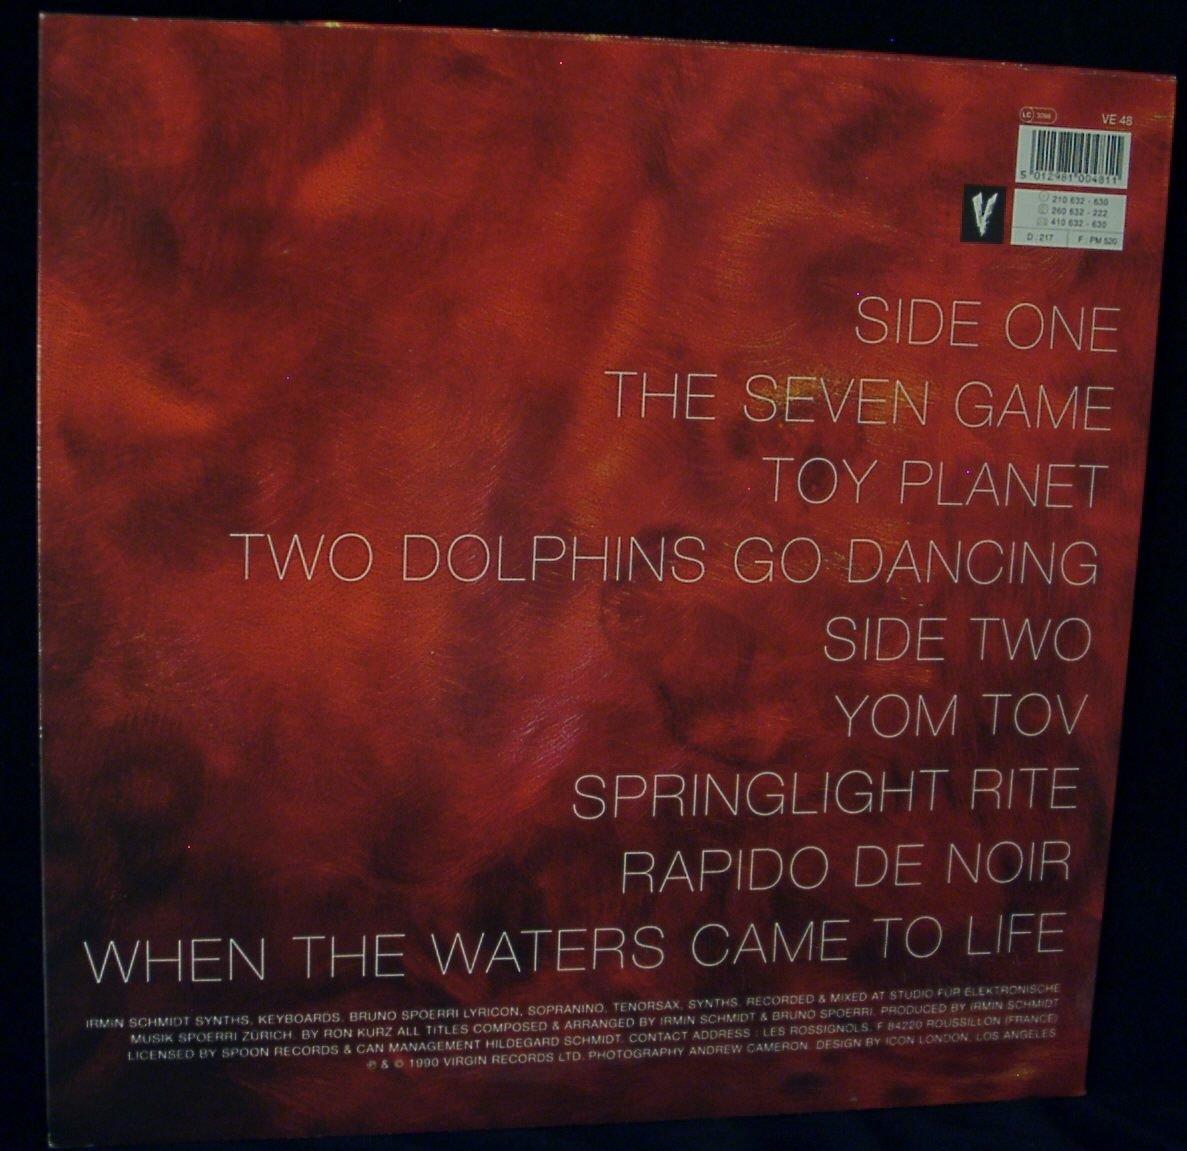 Amazon.com: Toy Planet (UK vinyl LP): Music